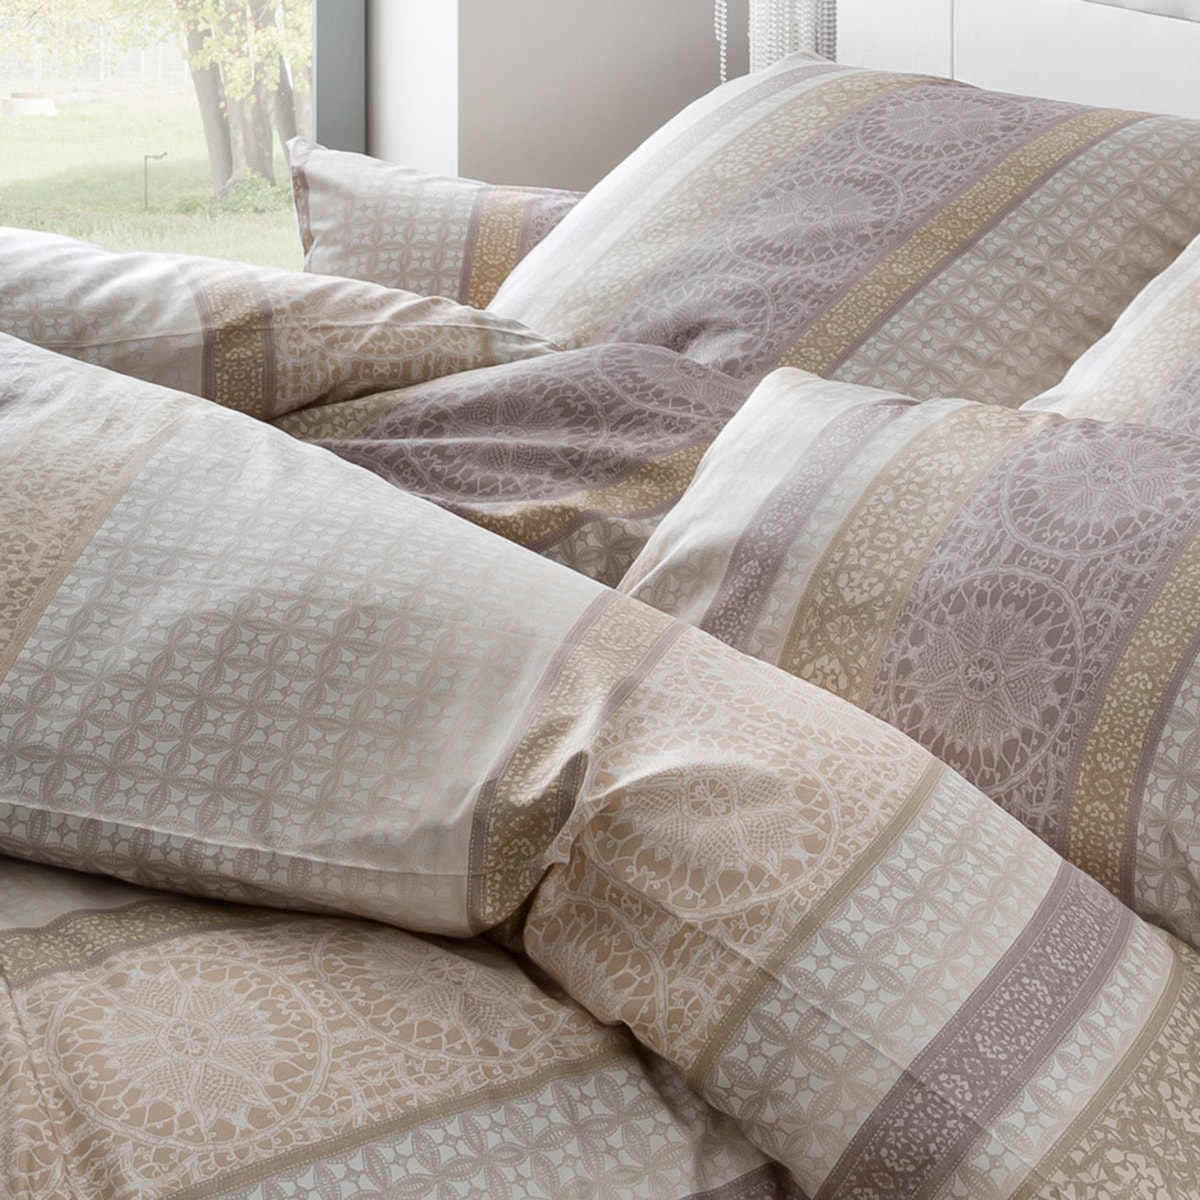 estella mako interlock jersey bettw sche 6252 095 bahama. Black Bedroom Furniture Sets. Home Design Ideas